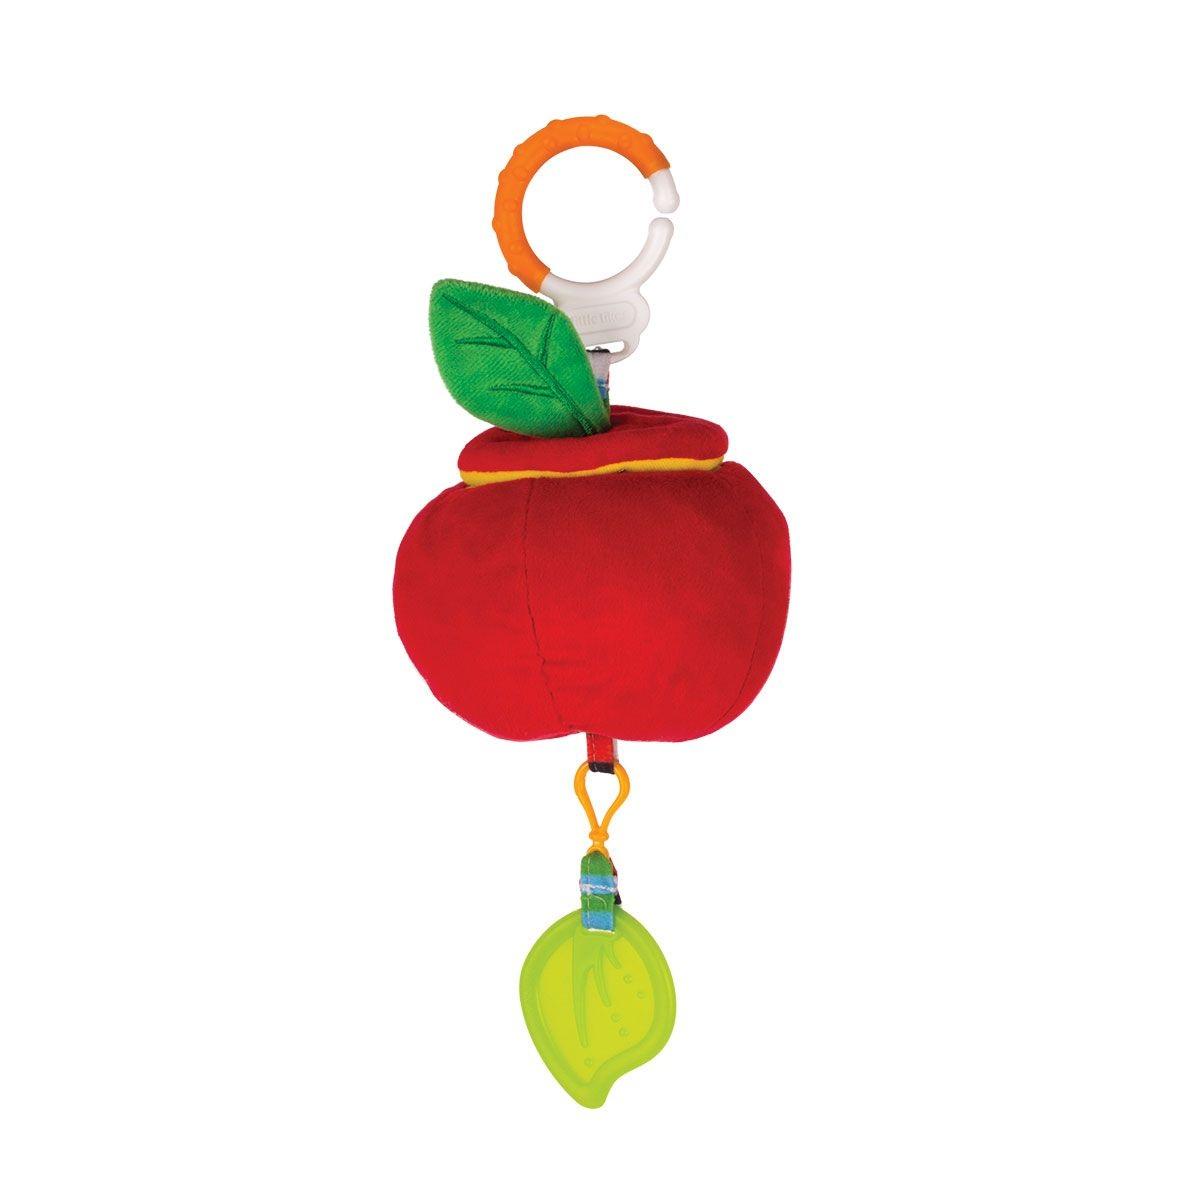 Игрушка-подвес кто в яблоке живёт Happy snail 17HS02PA игрушка подвес кто в яблоке живёт happy snail 17hs02pa